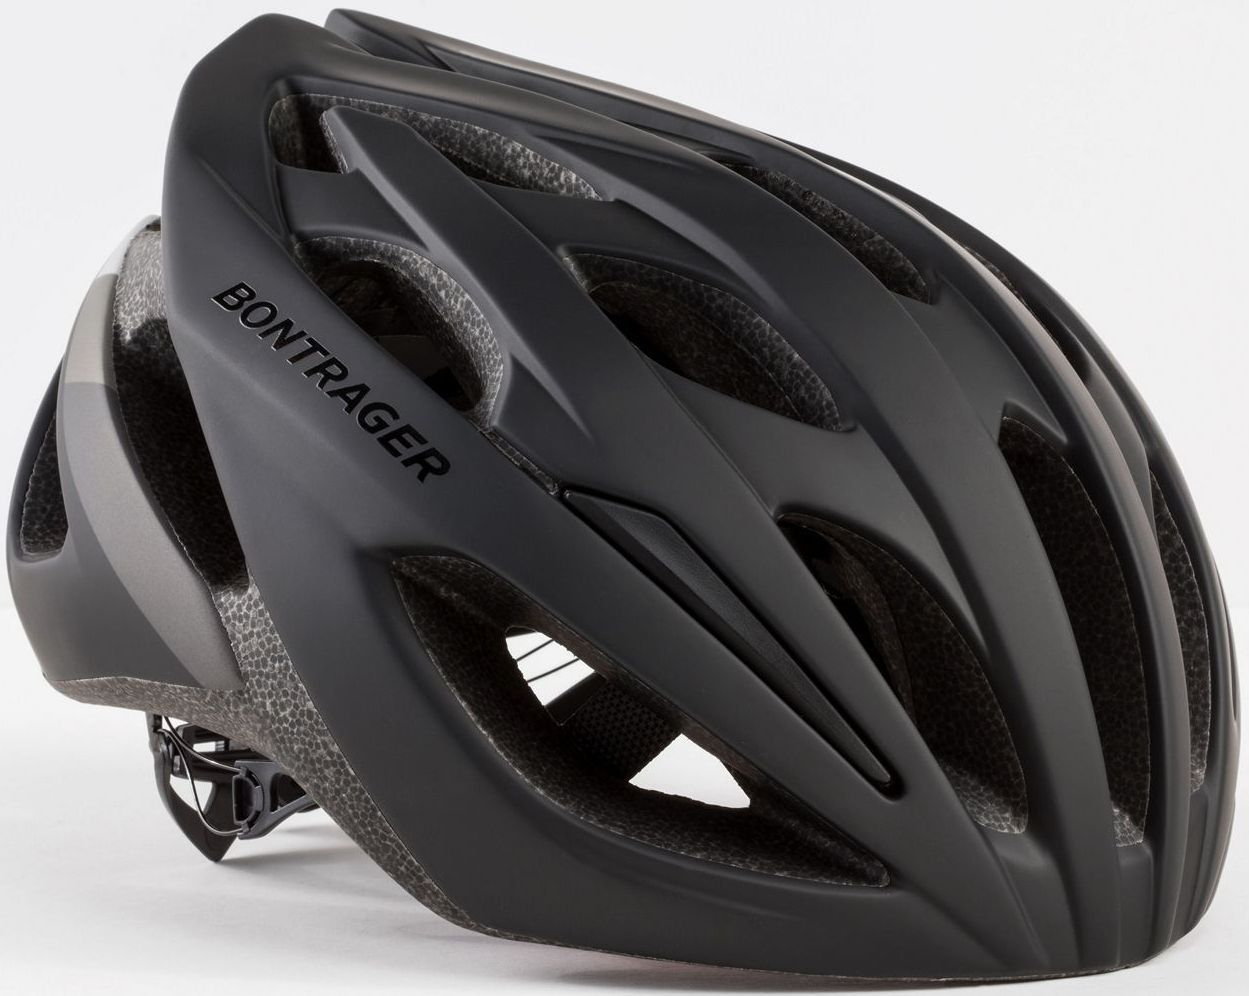 c86e5f0ee4 Bontrager Starvos MIPS Road Bike Helmet - black L-(58-63)